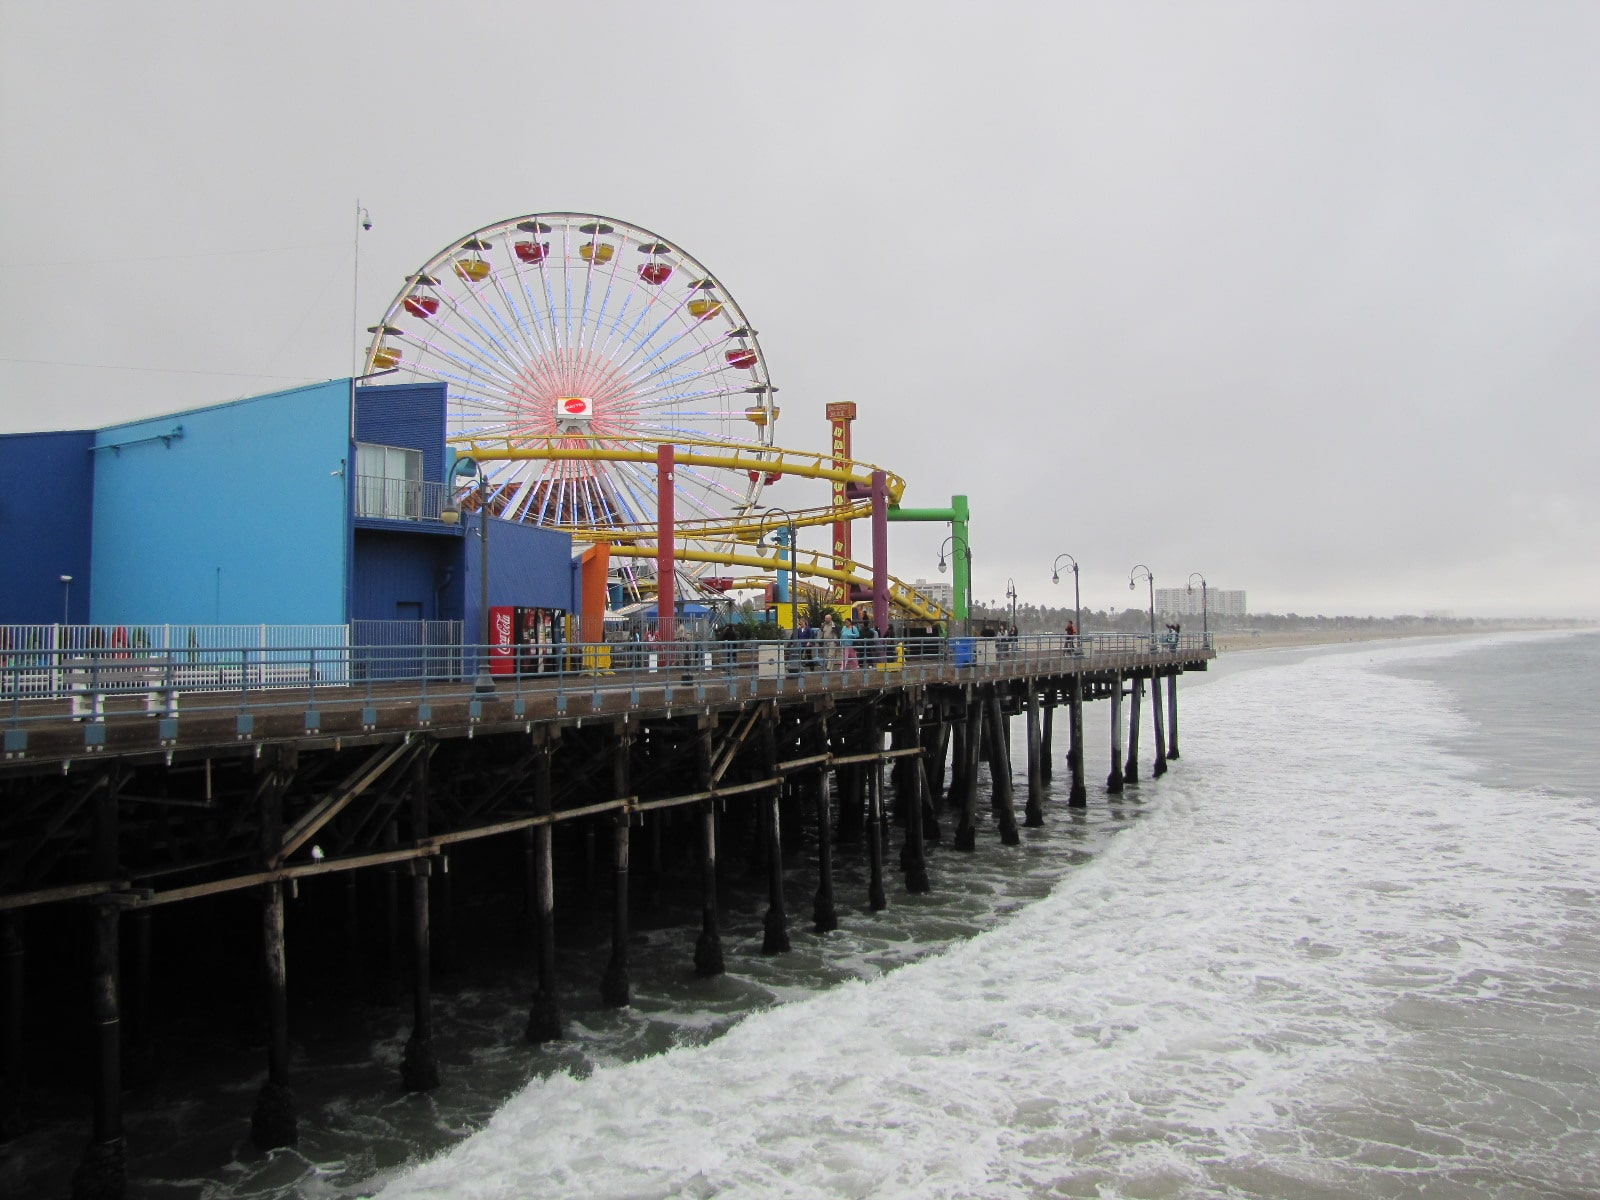 La fete foraine de Santa Monica